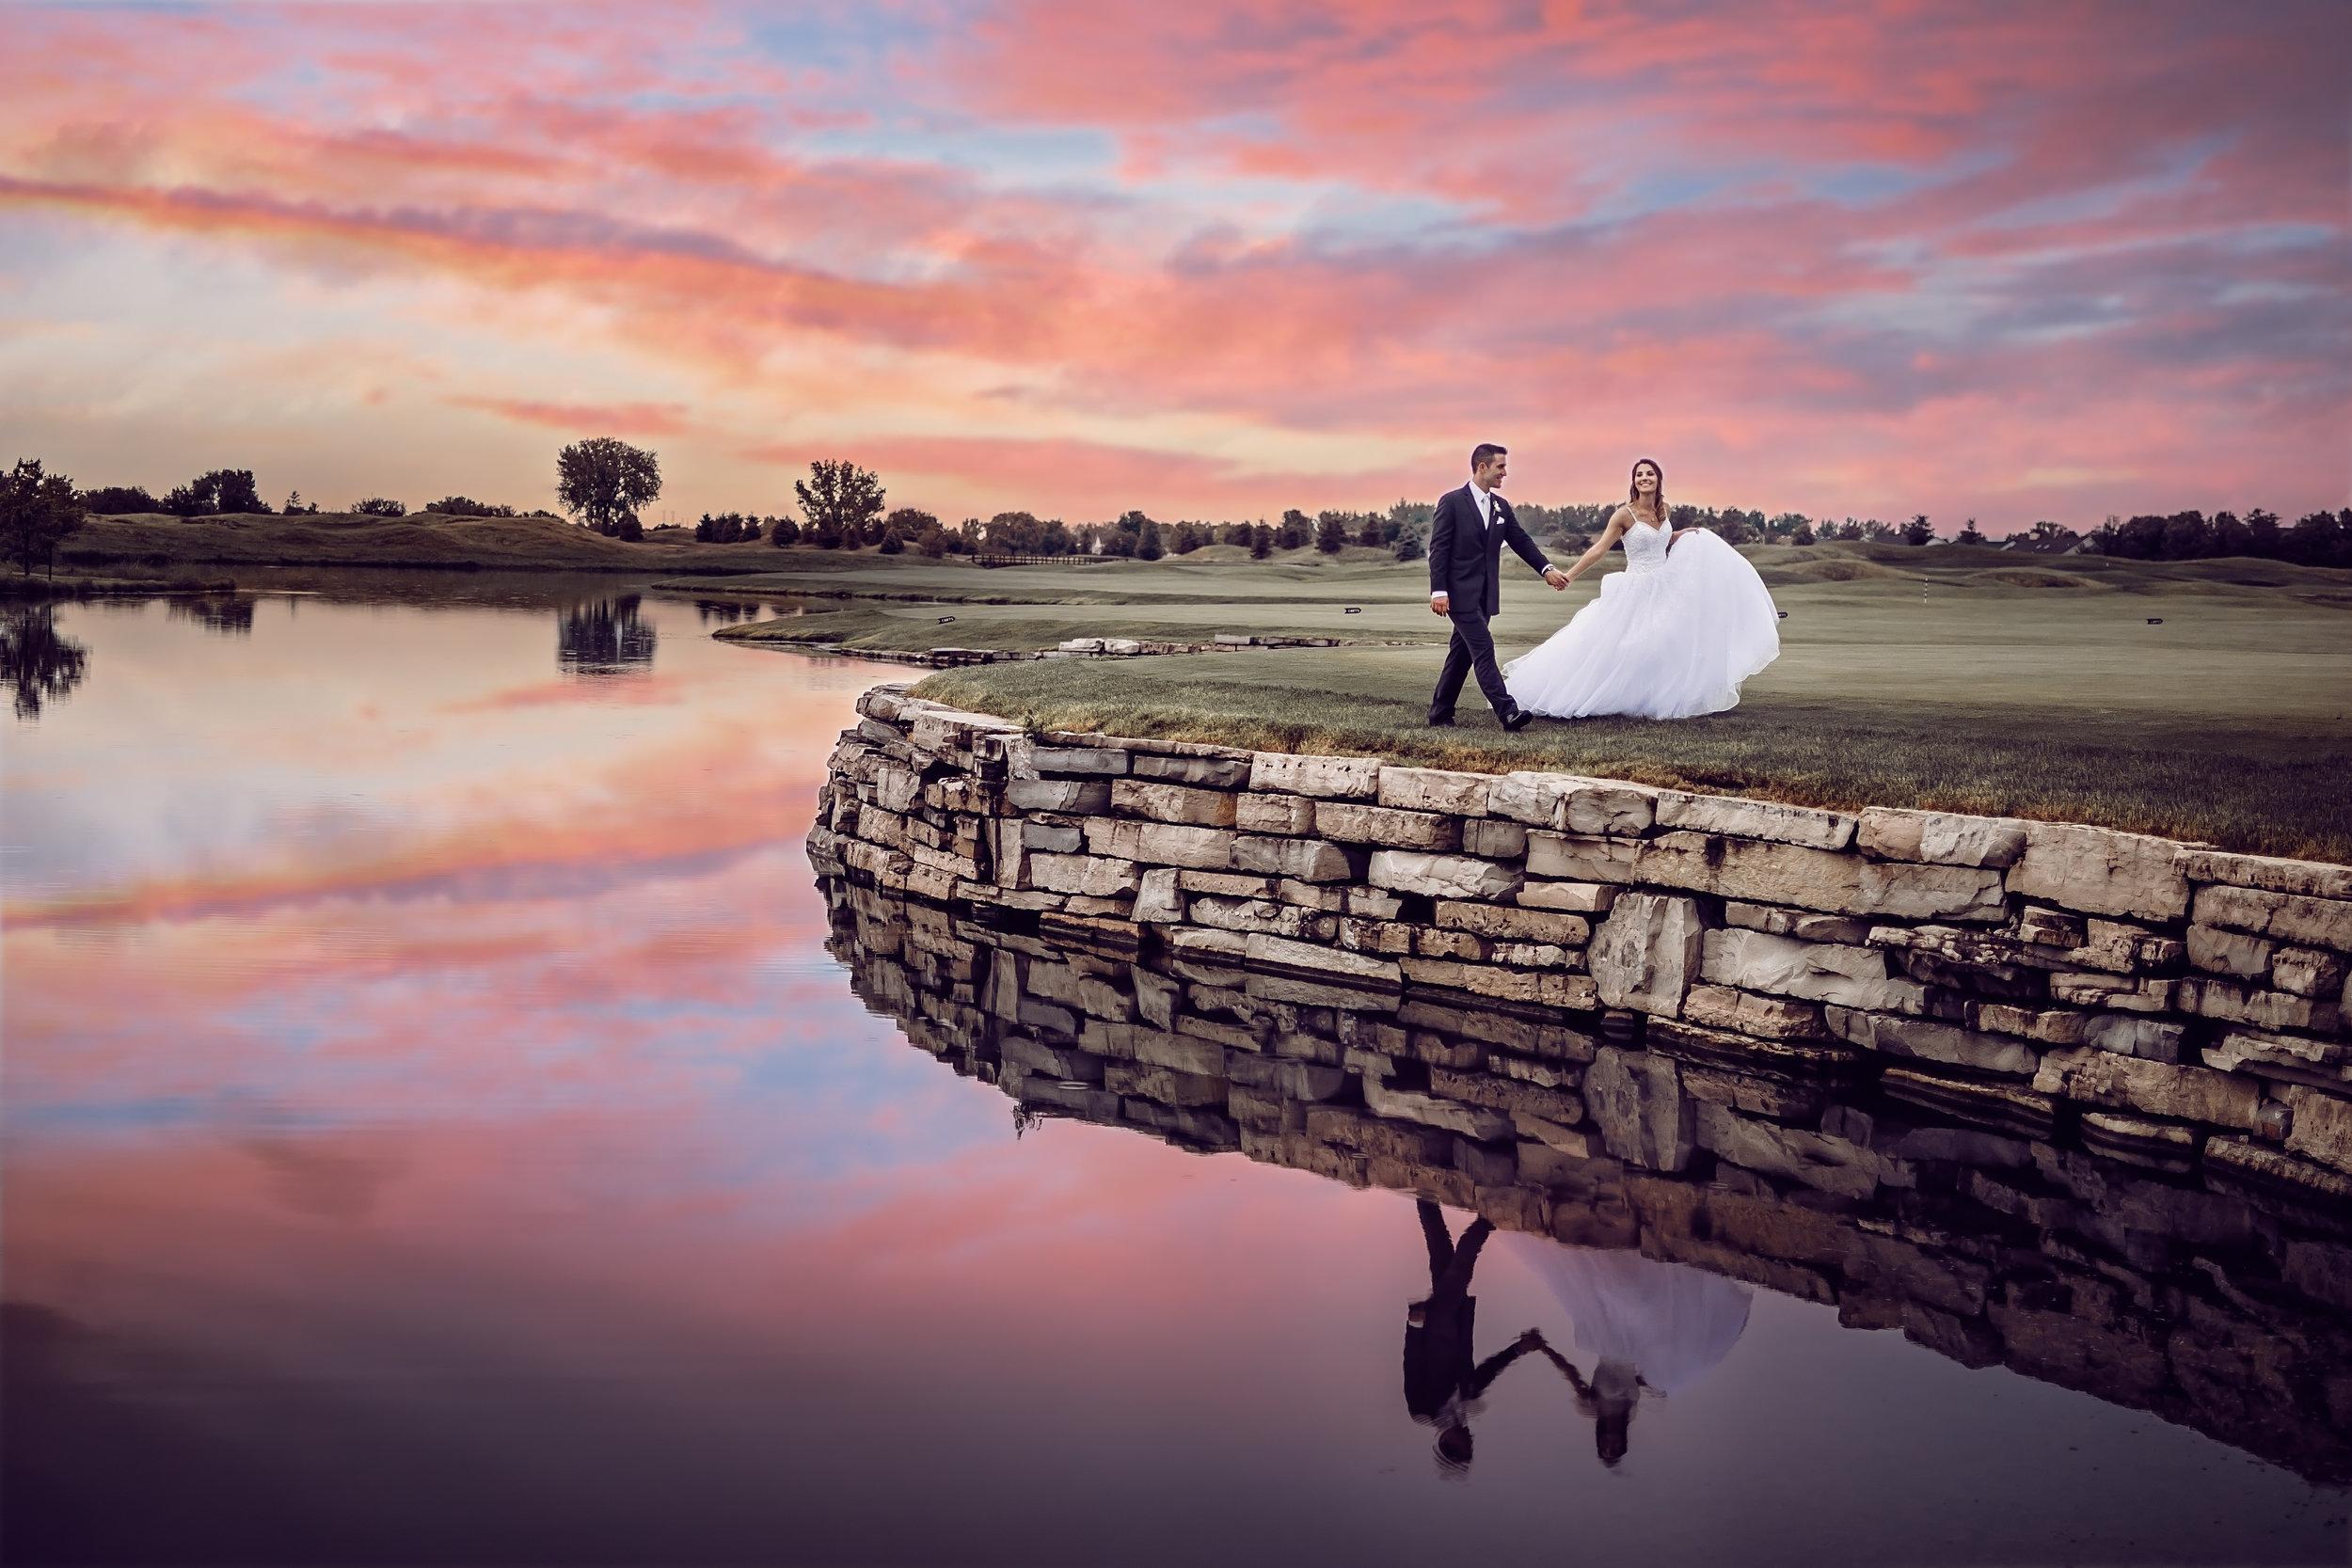 Wedding-couple-takes-photos-at-lowes-hardware-due-to-rain42.jpg